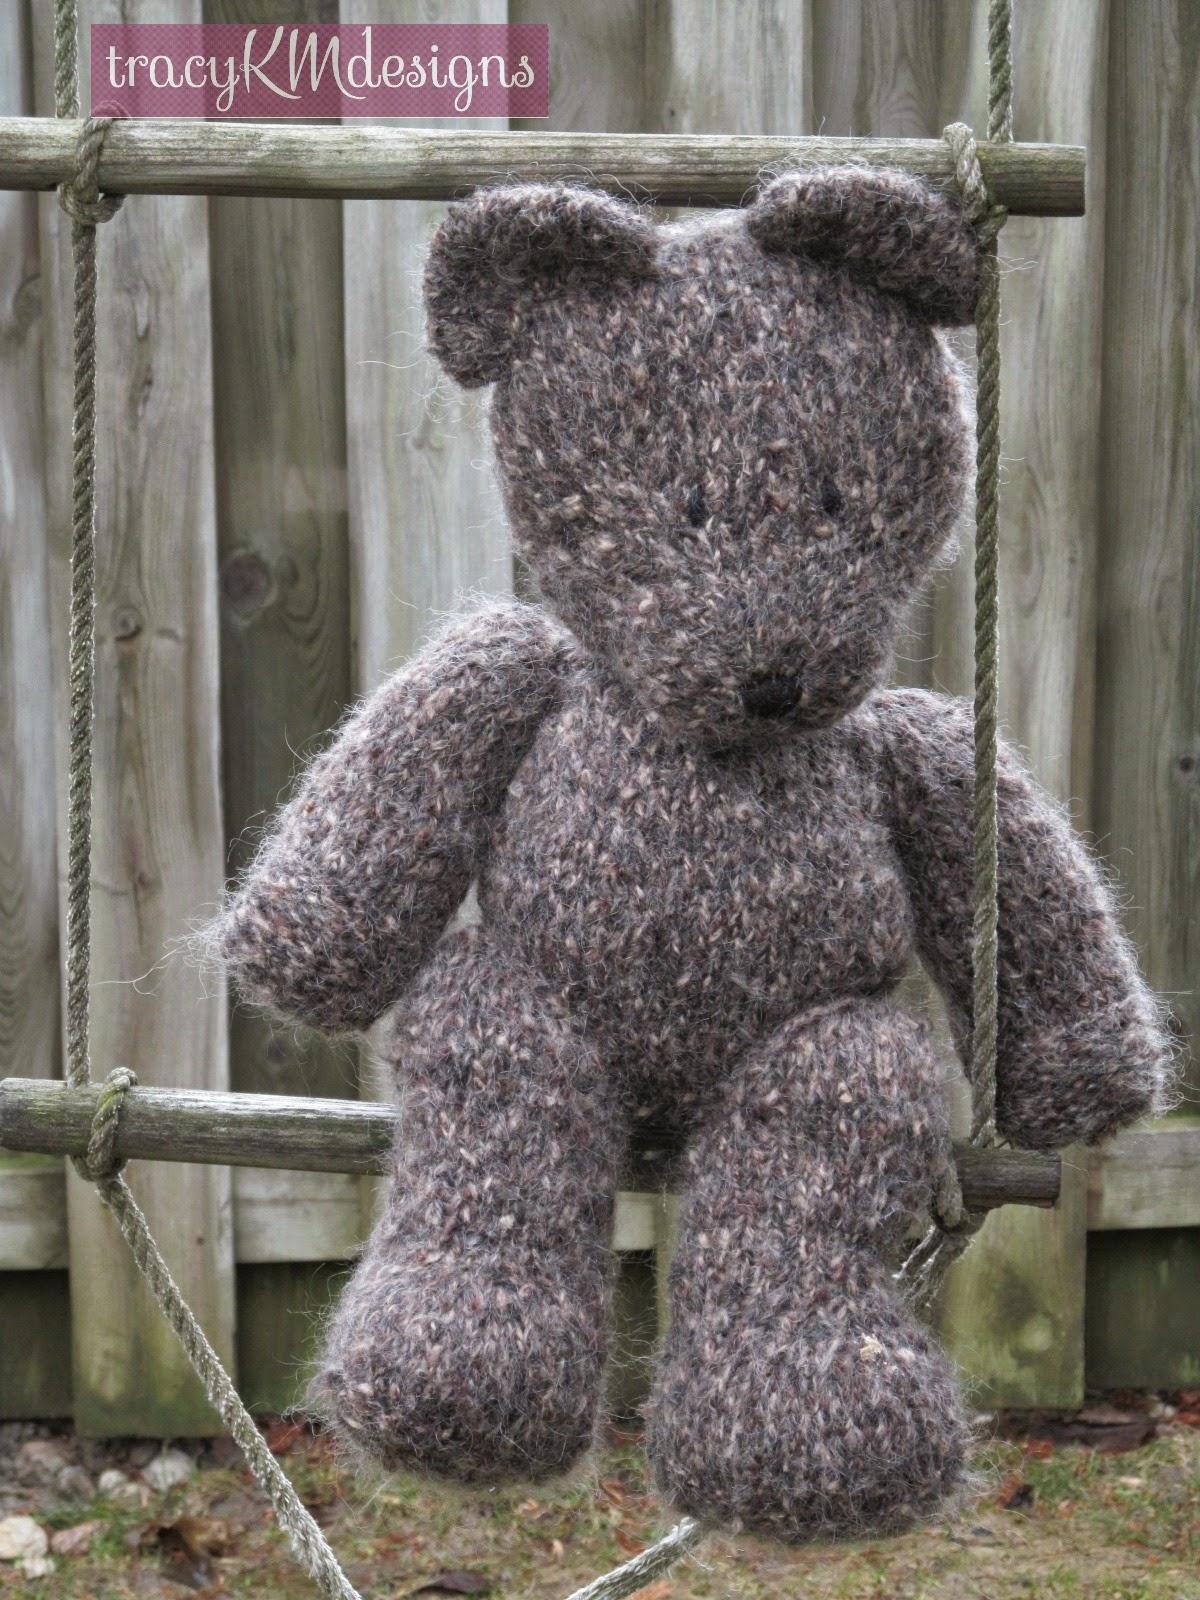 Old fashioned teddy bear crochet pattern 94